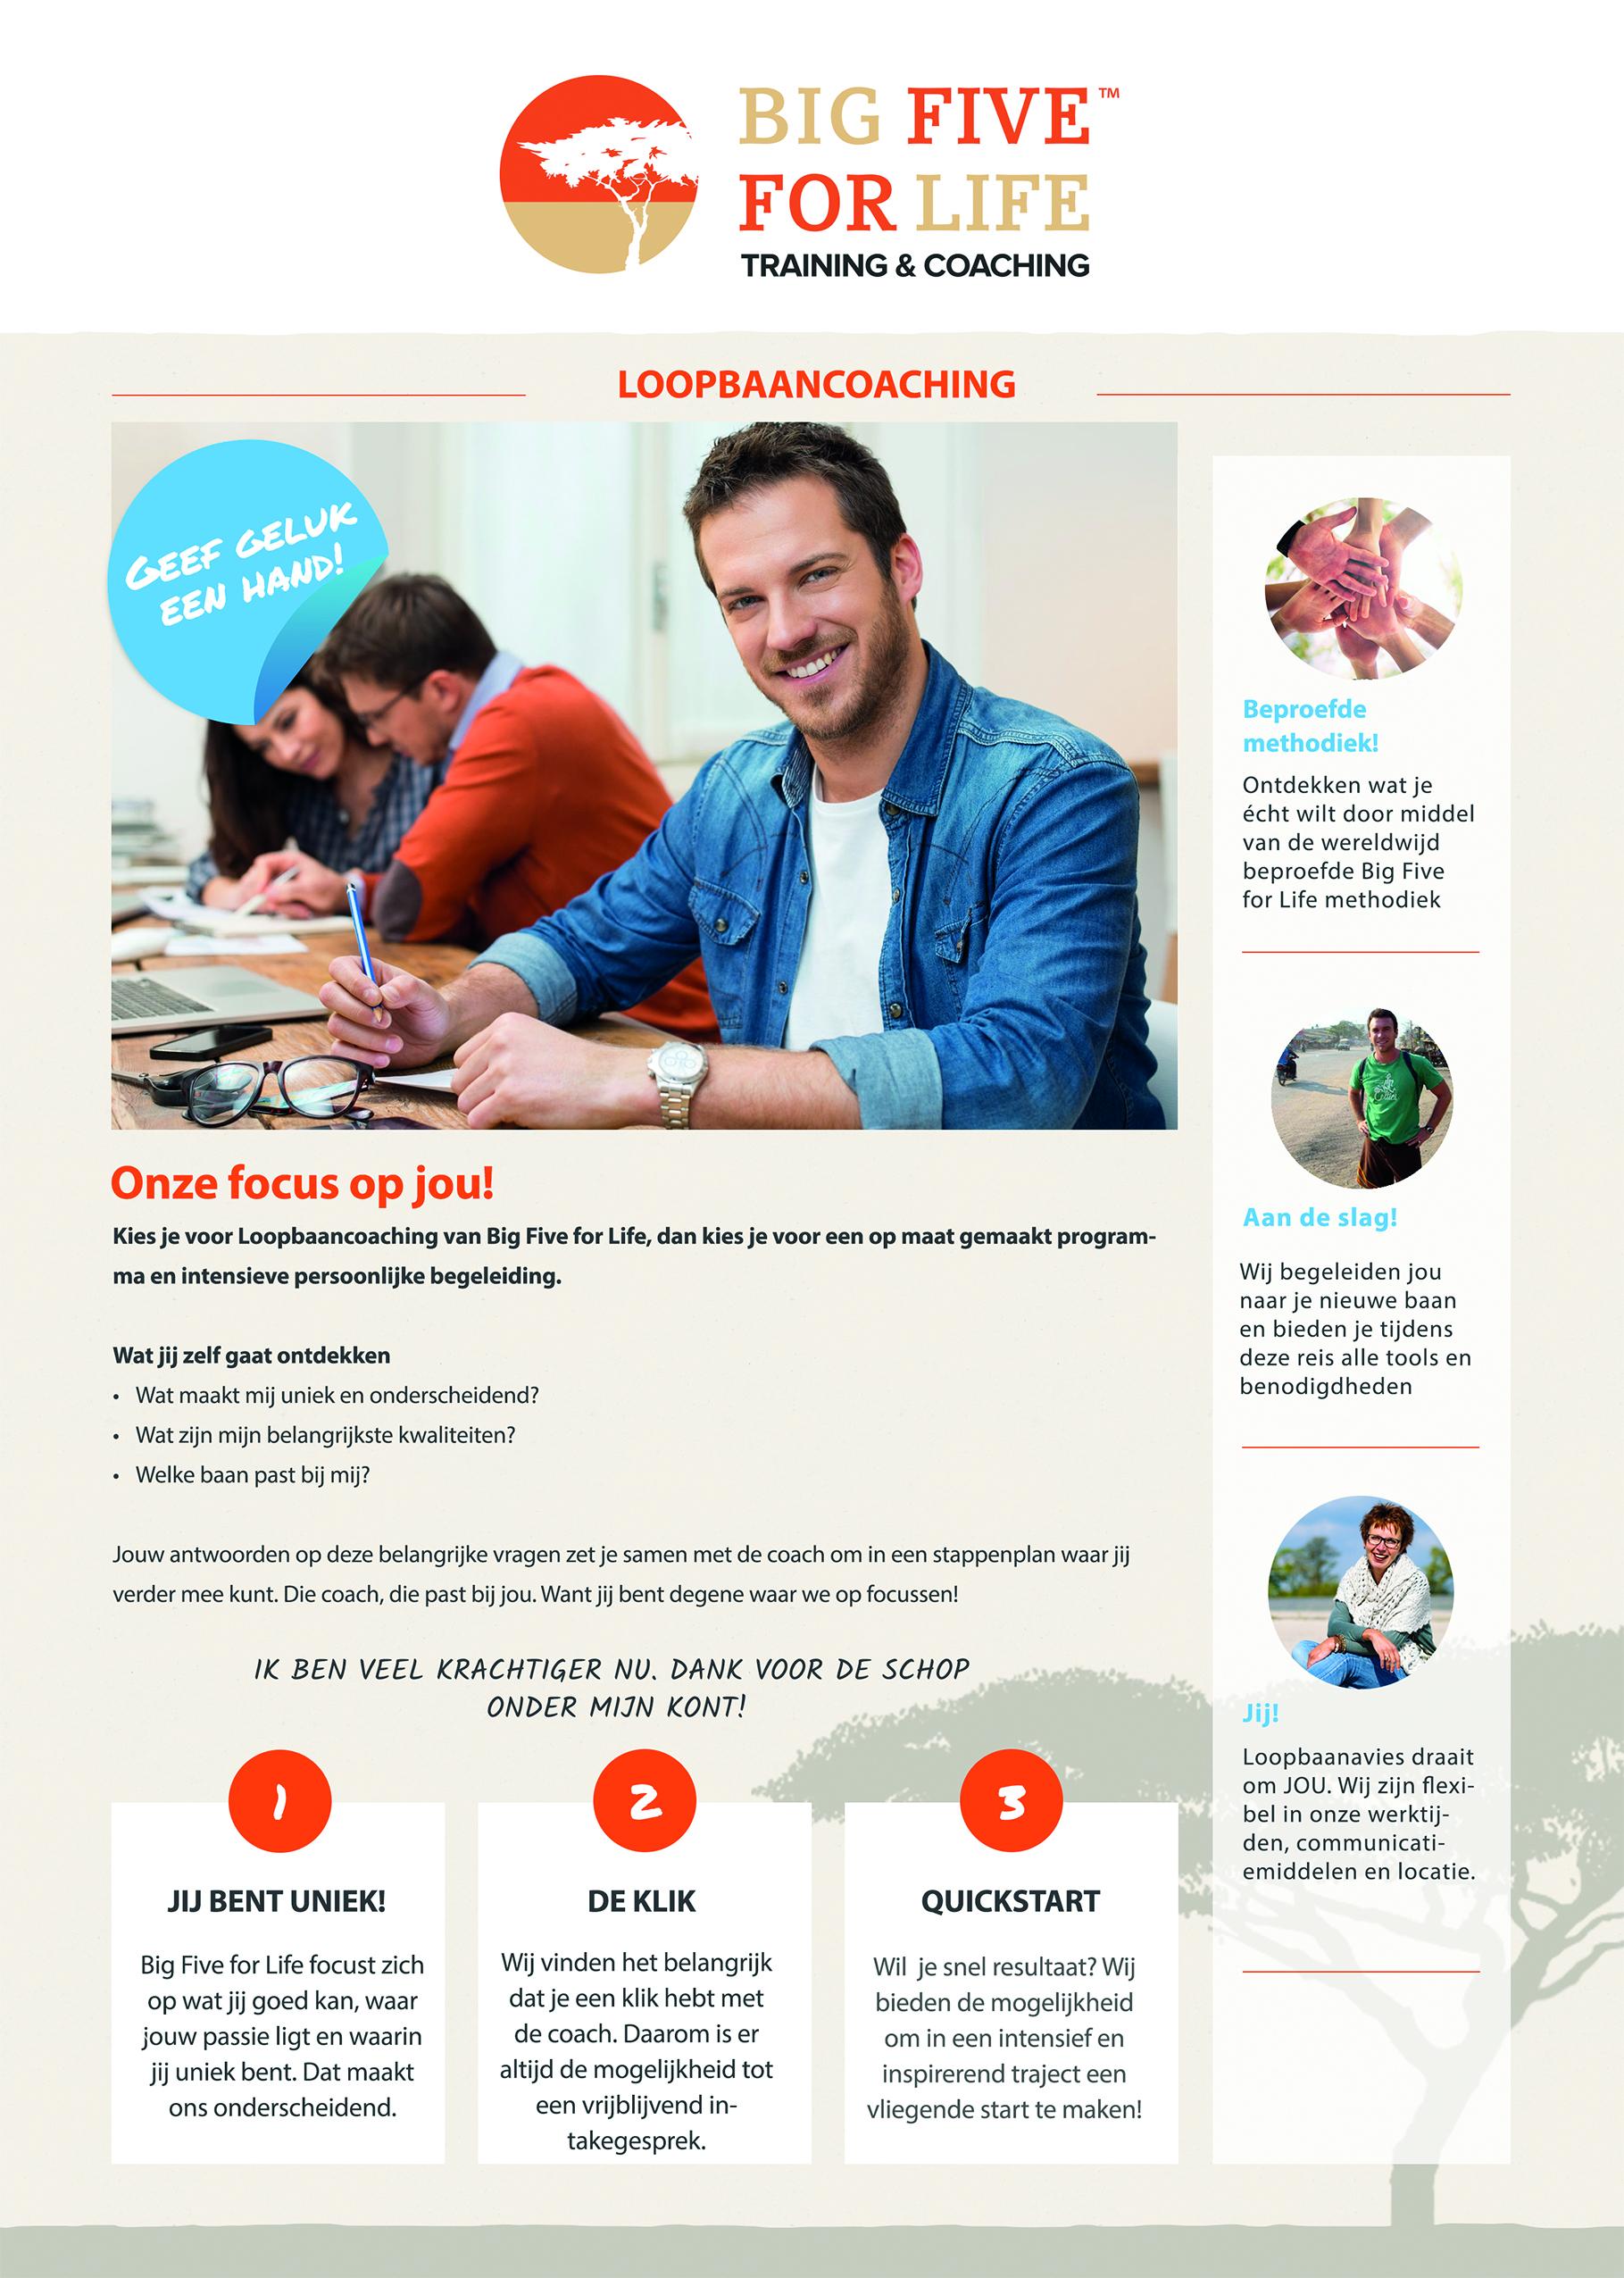 brochure-a4-bffl-loopbaancoaching-annet-drukgereed